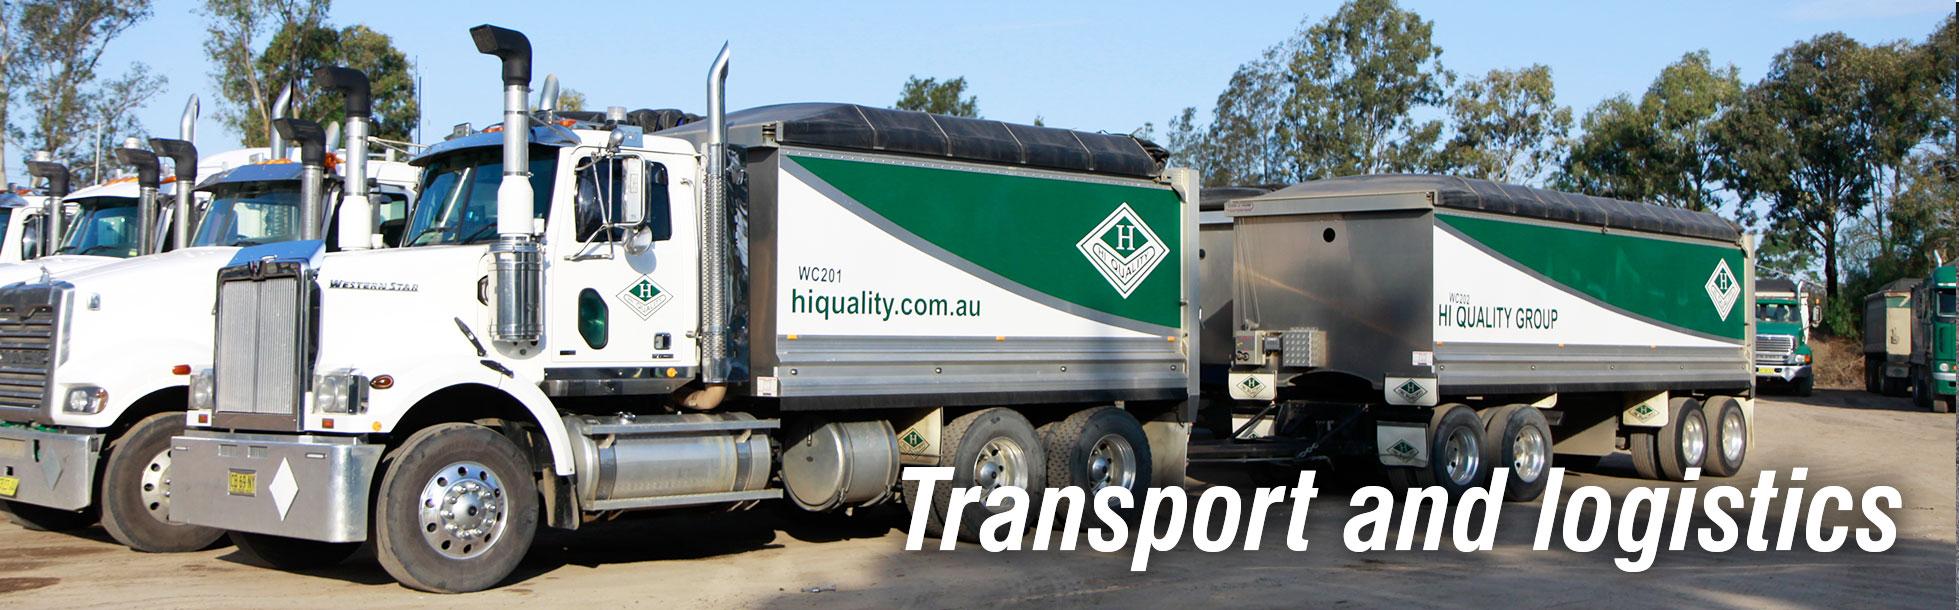 transpot-and-logistics-NEW